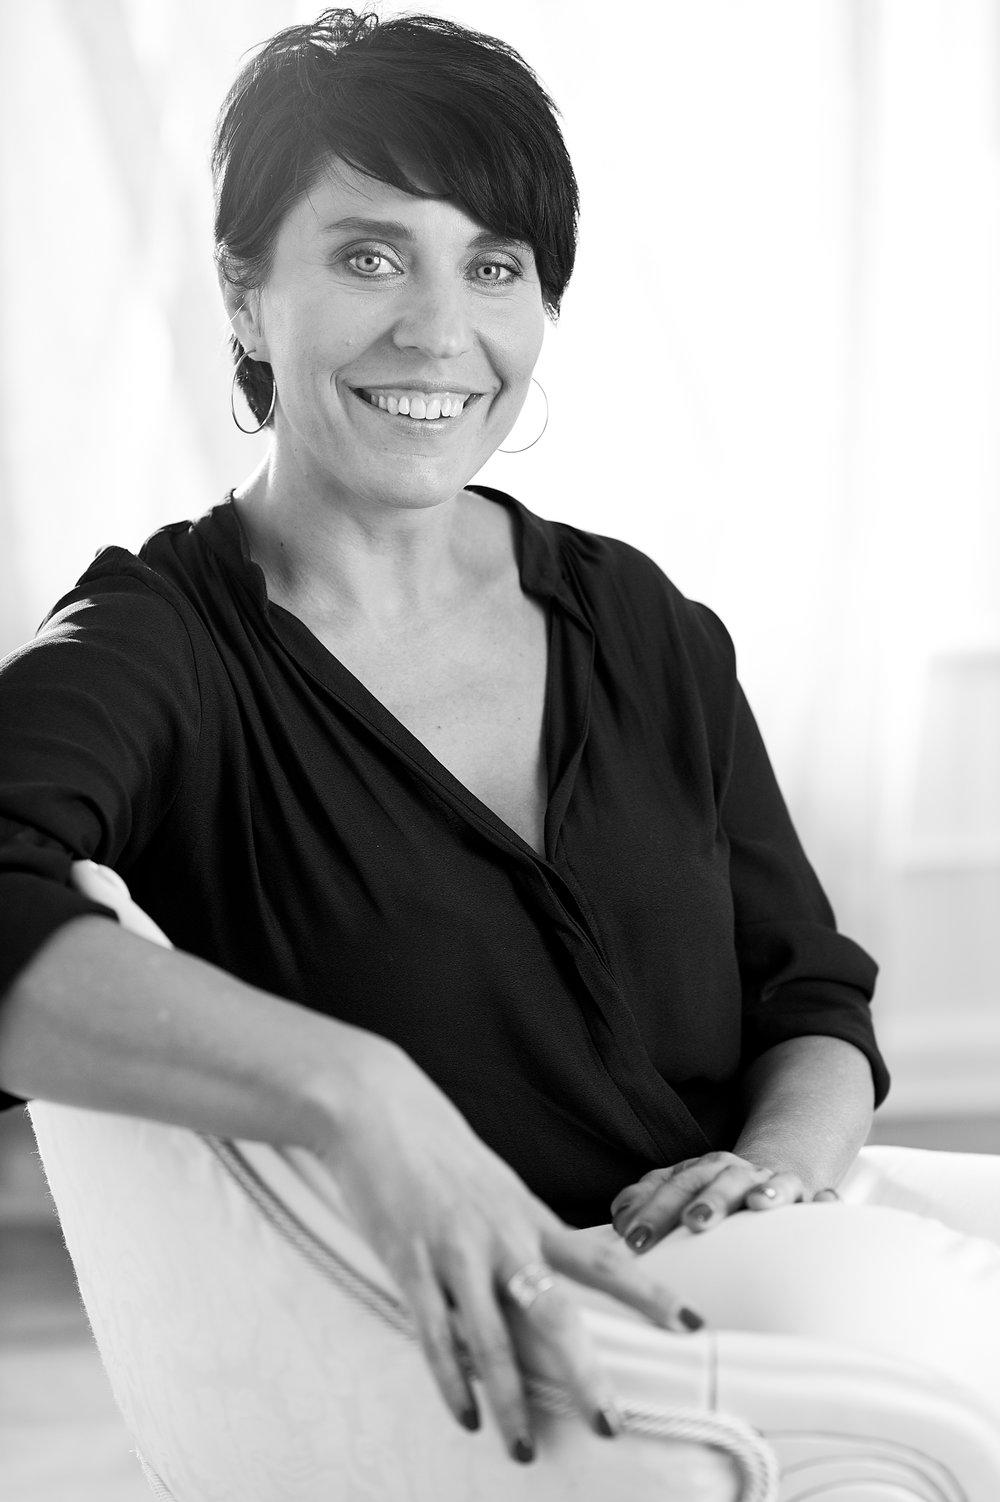 Marta-Hewson-Editorial-Portraits-Kamila-Headshot.jpg